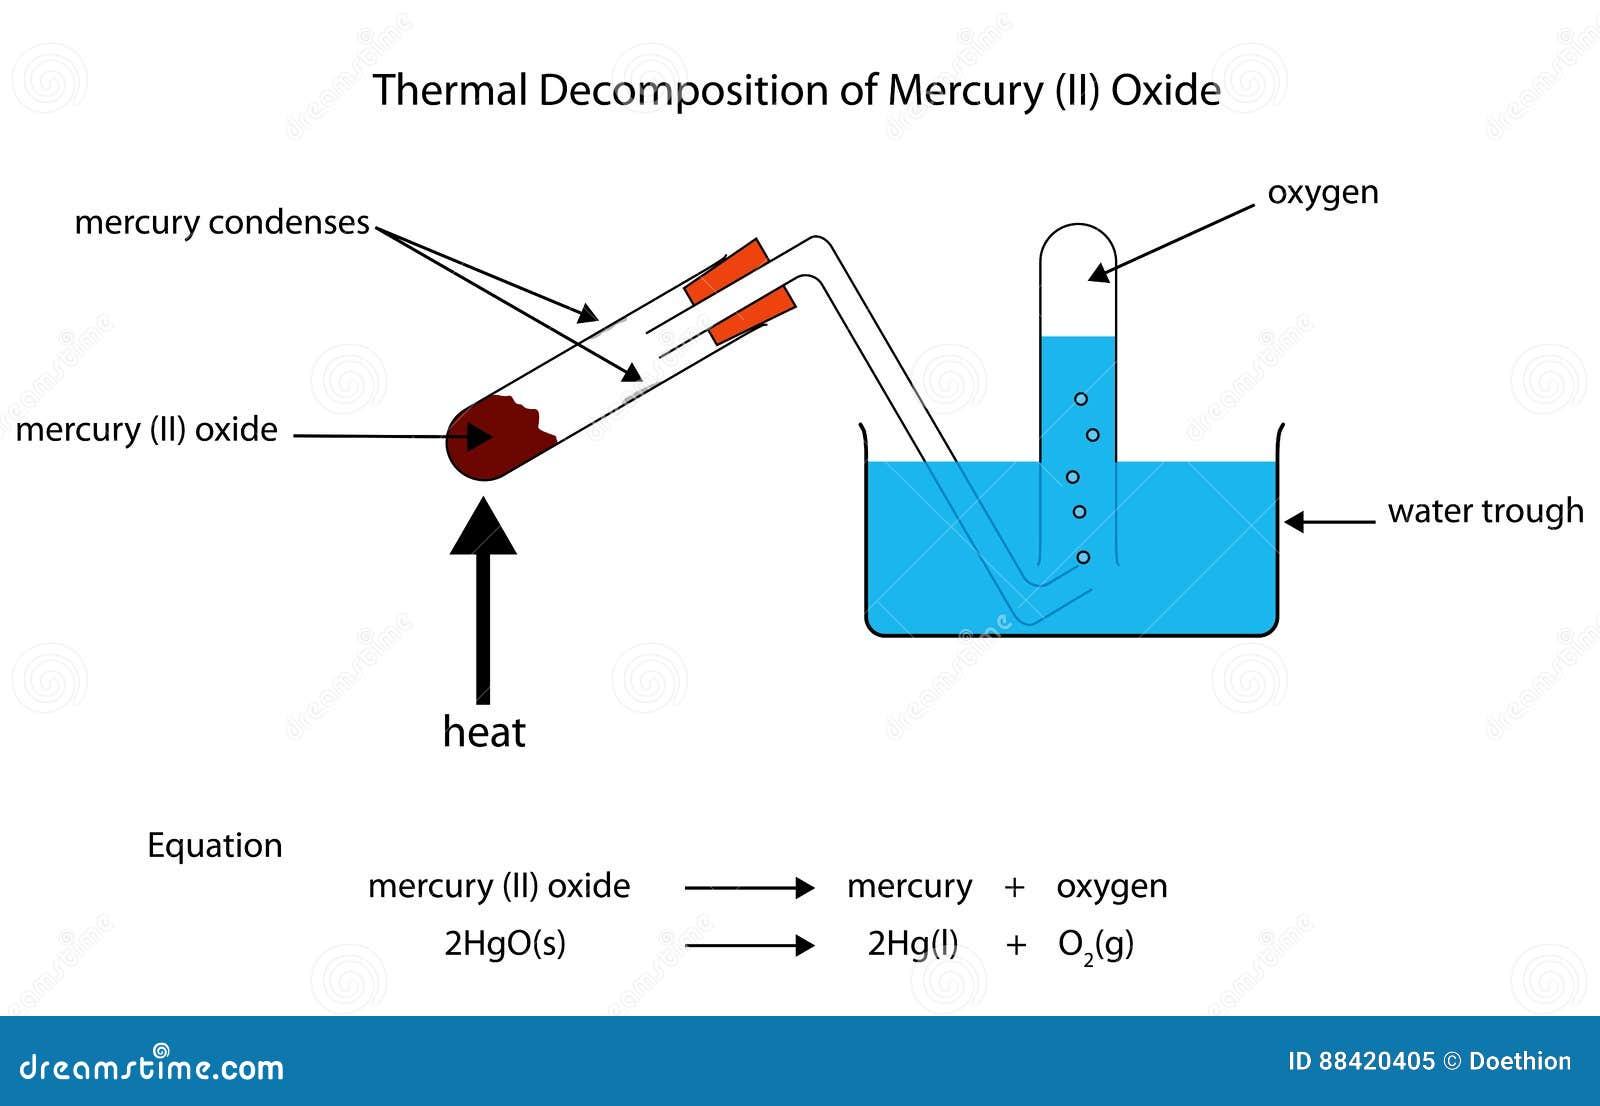 2002 Mercury Villager Engine Diagram Free Download Wiring Diagrams